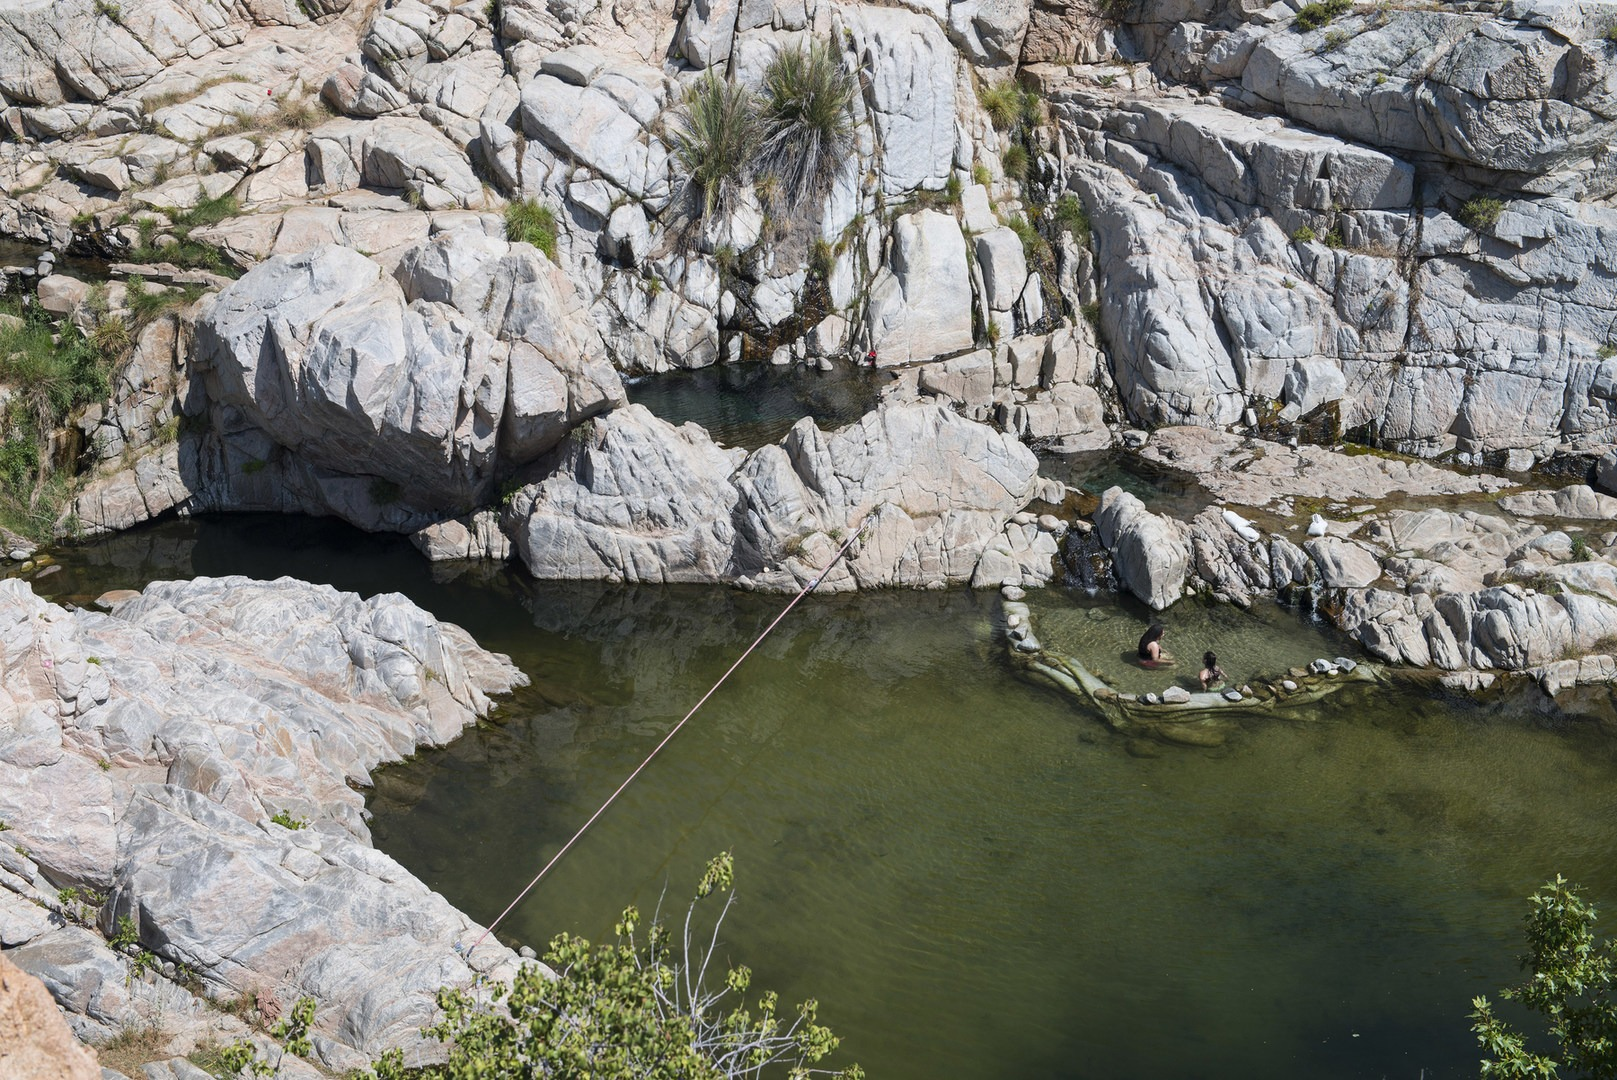 Colorado ZR2 and Jeep JK Rubicon on Lake Arrowhead 4x4 ...  |Devils Hole Arrowhead